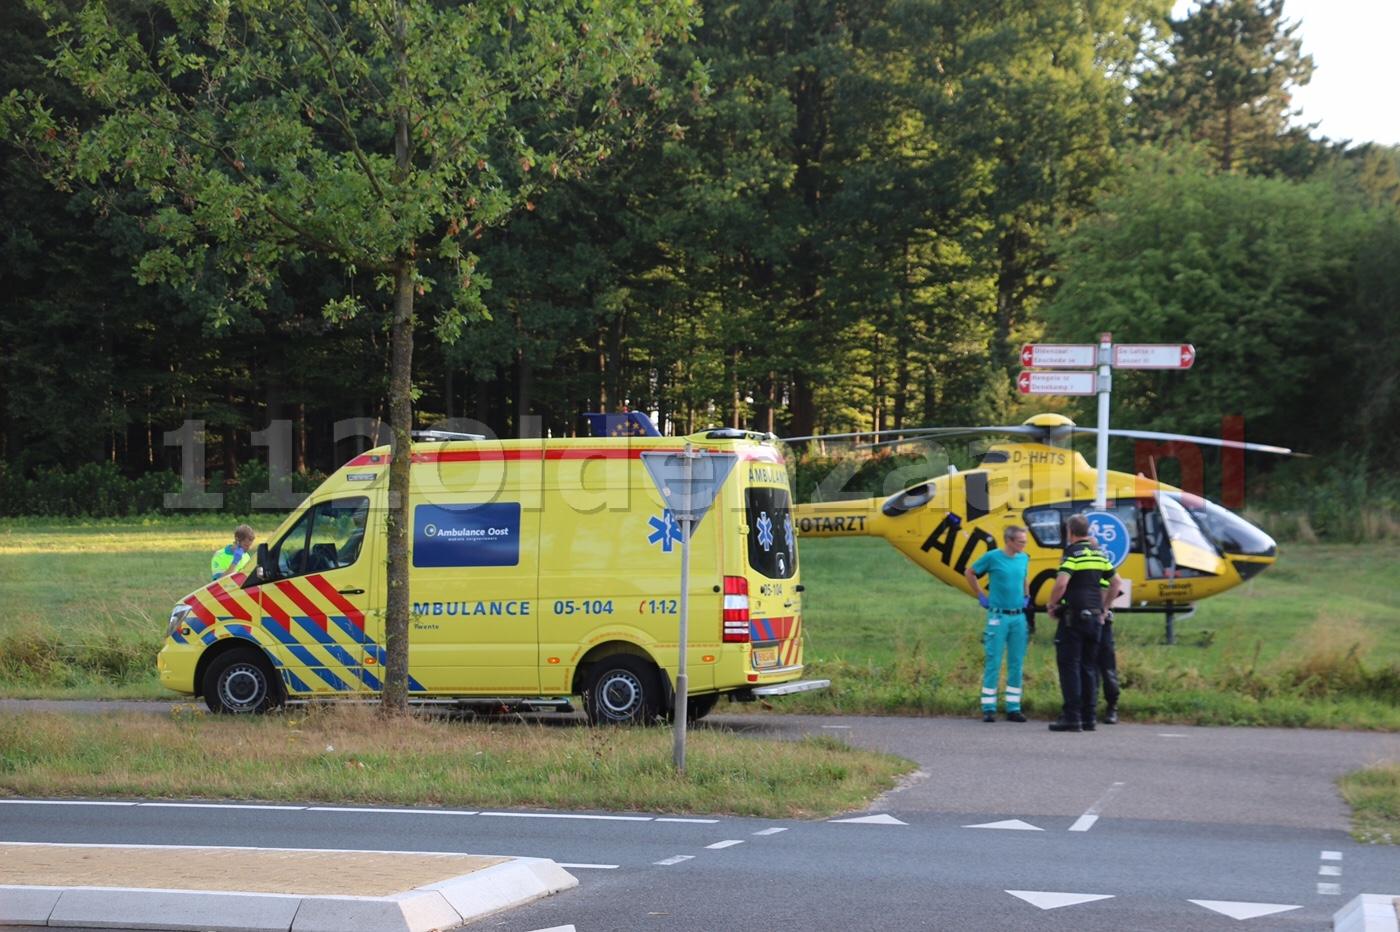 VIDEO: Bouwvakker gewond na ongeval op bouwplaats; traumahelikopter landt in Oldenzaal